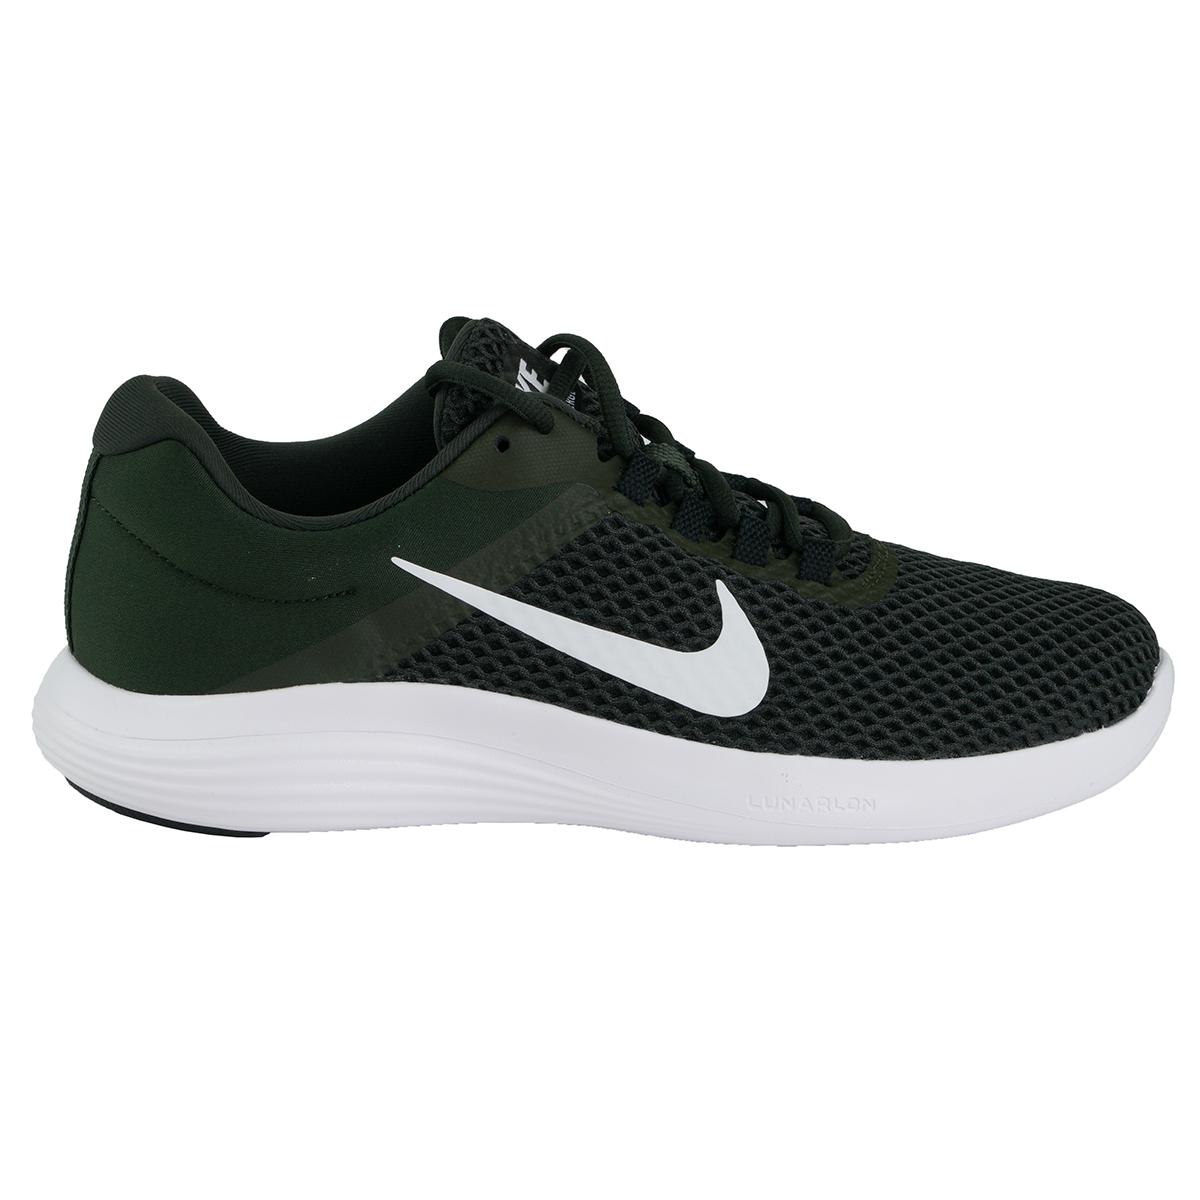 the latest d12f7 ced77 Details about Nike Men s Lunar Converge 2 Shoes